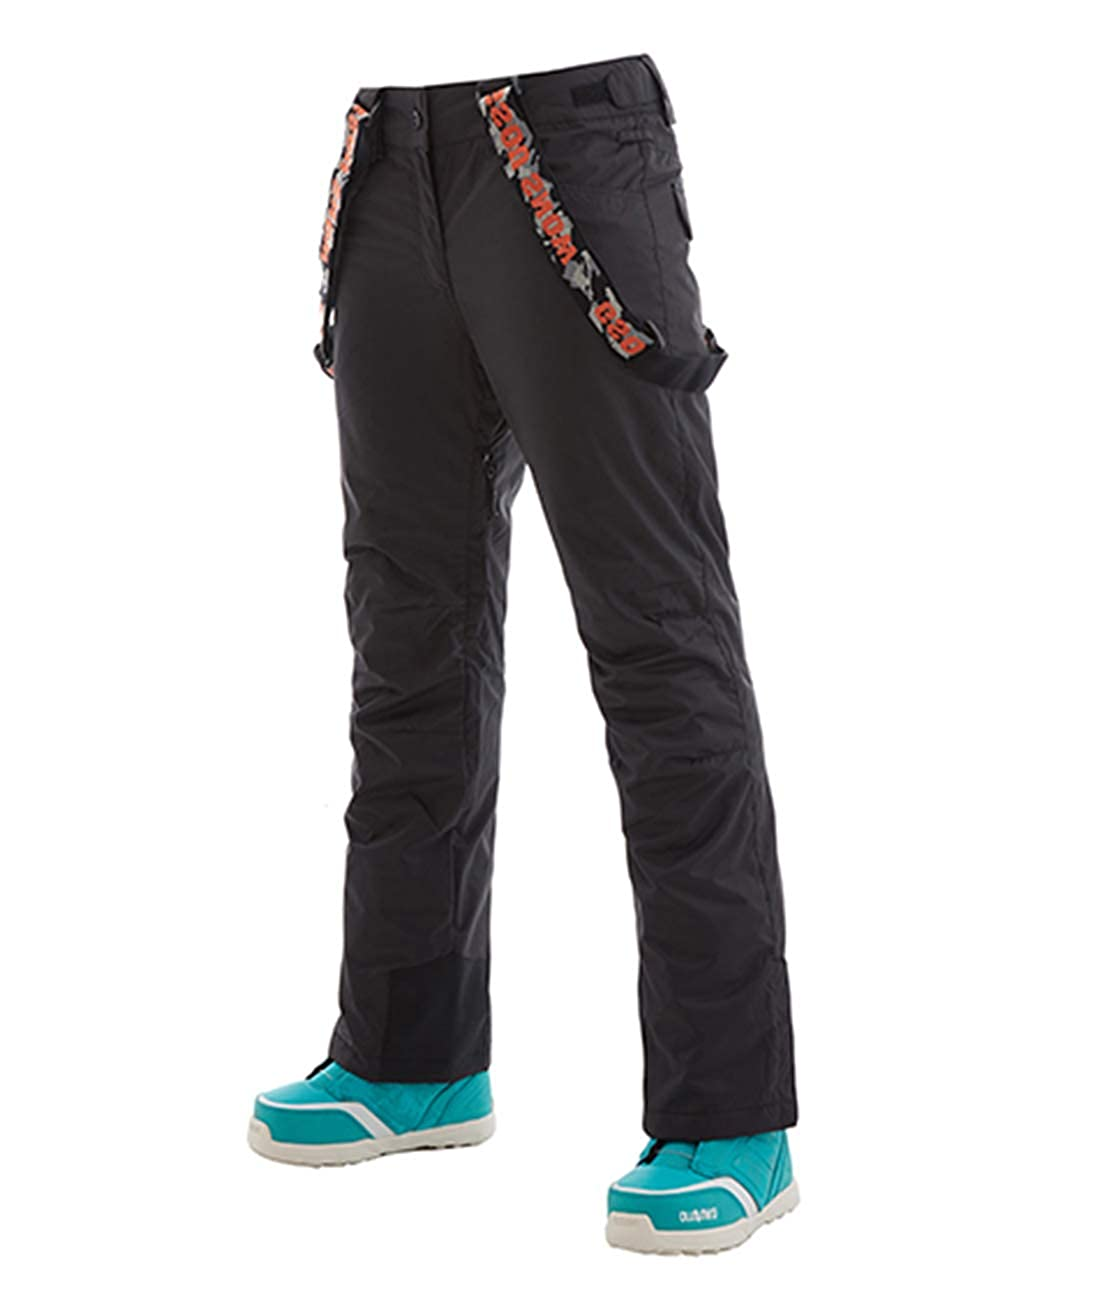 APTRO Womens//Girls Windproof Waterproof Snow Pants Removable Suspenders Insulated Ski Pants